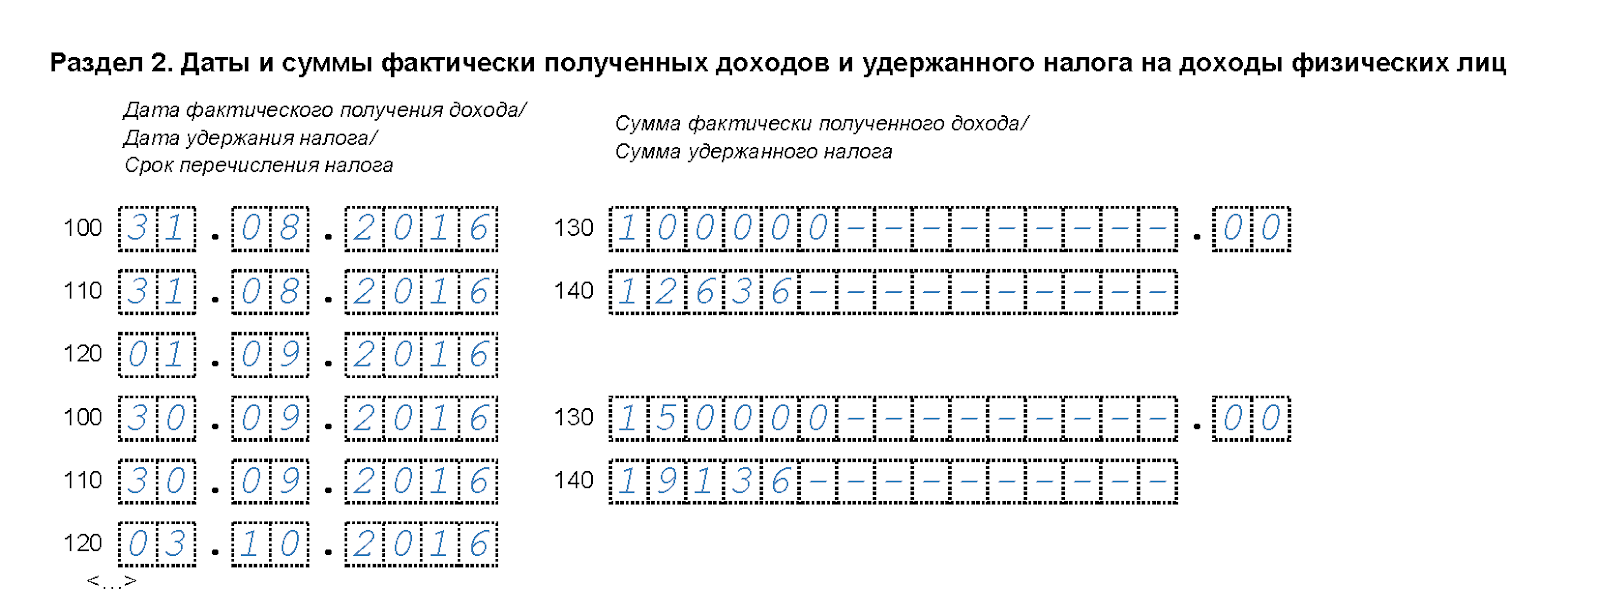 Образец заполнения 6 НДФЛ за 3 квартал 2016 года 2